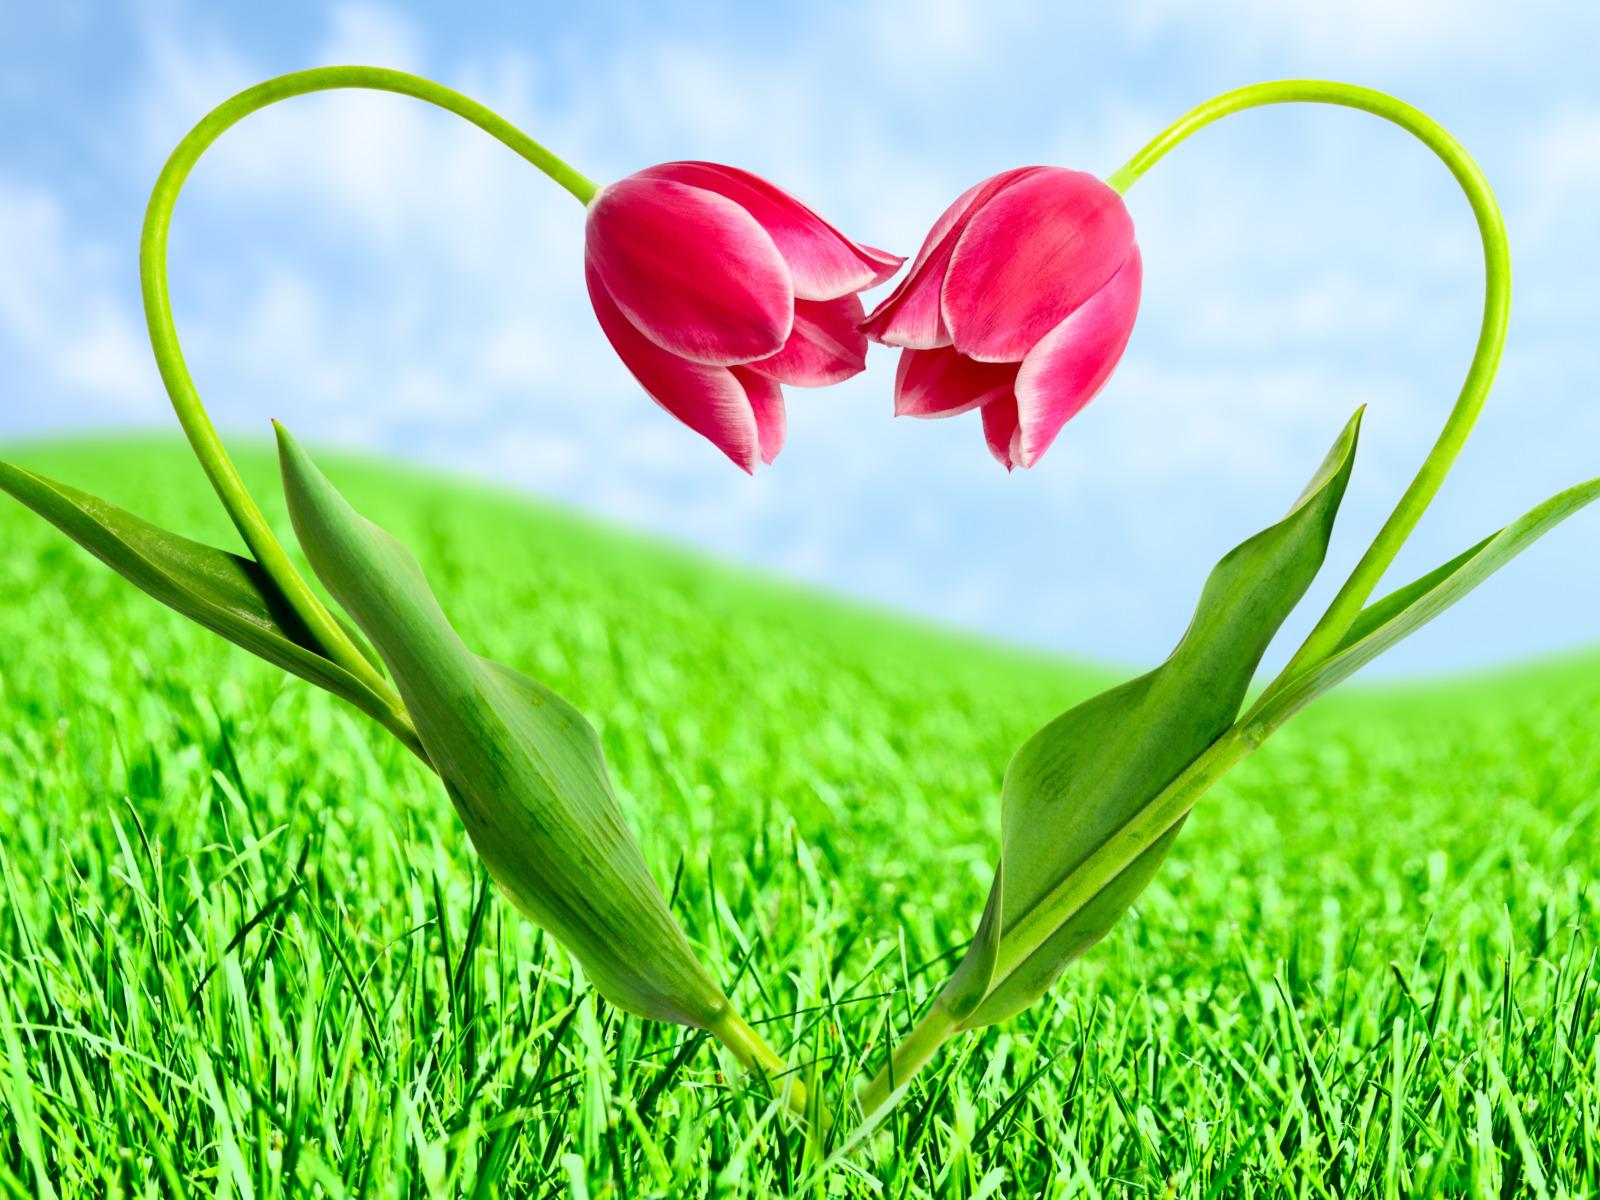 Сердце из зелени  № 1599107 без смс